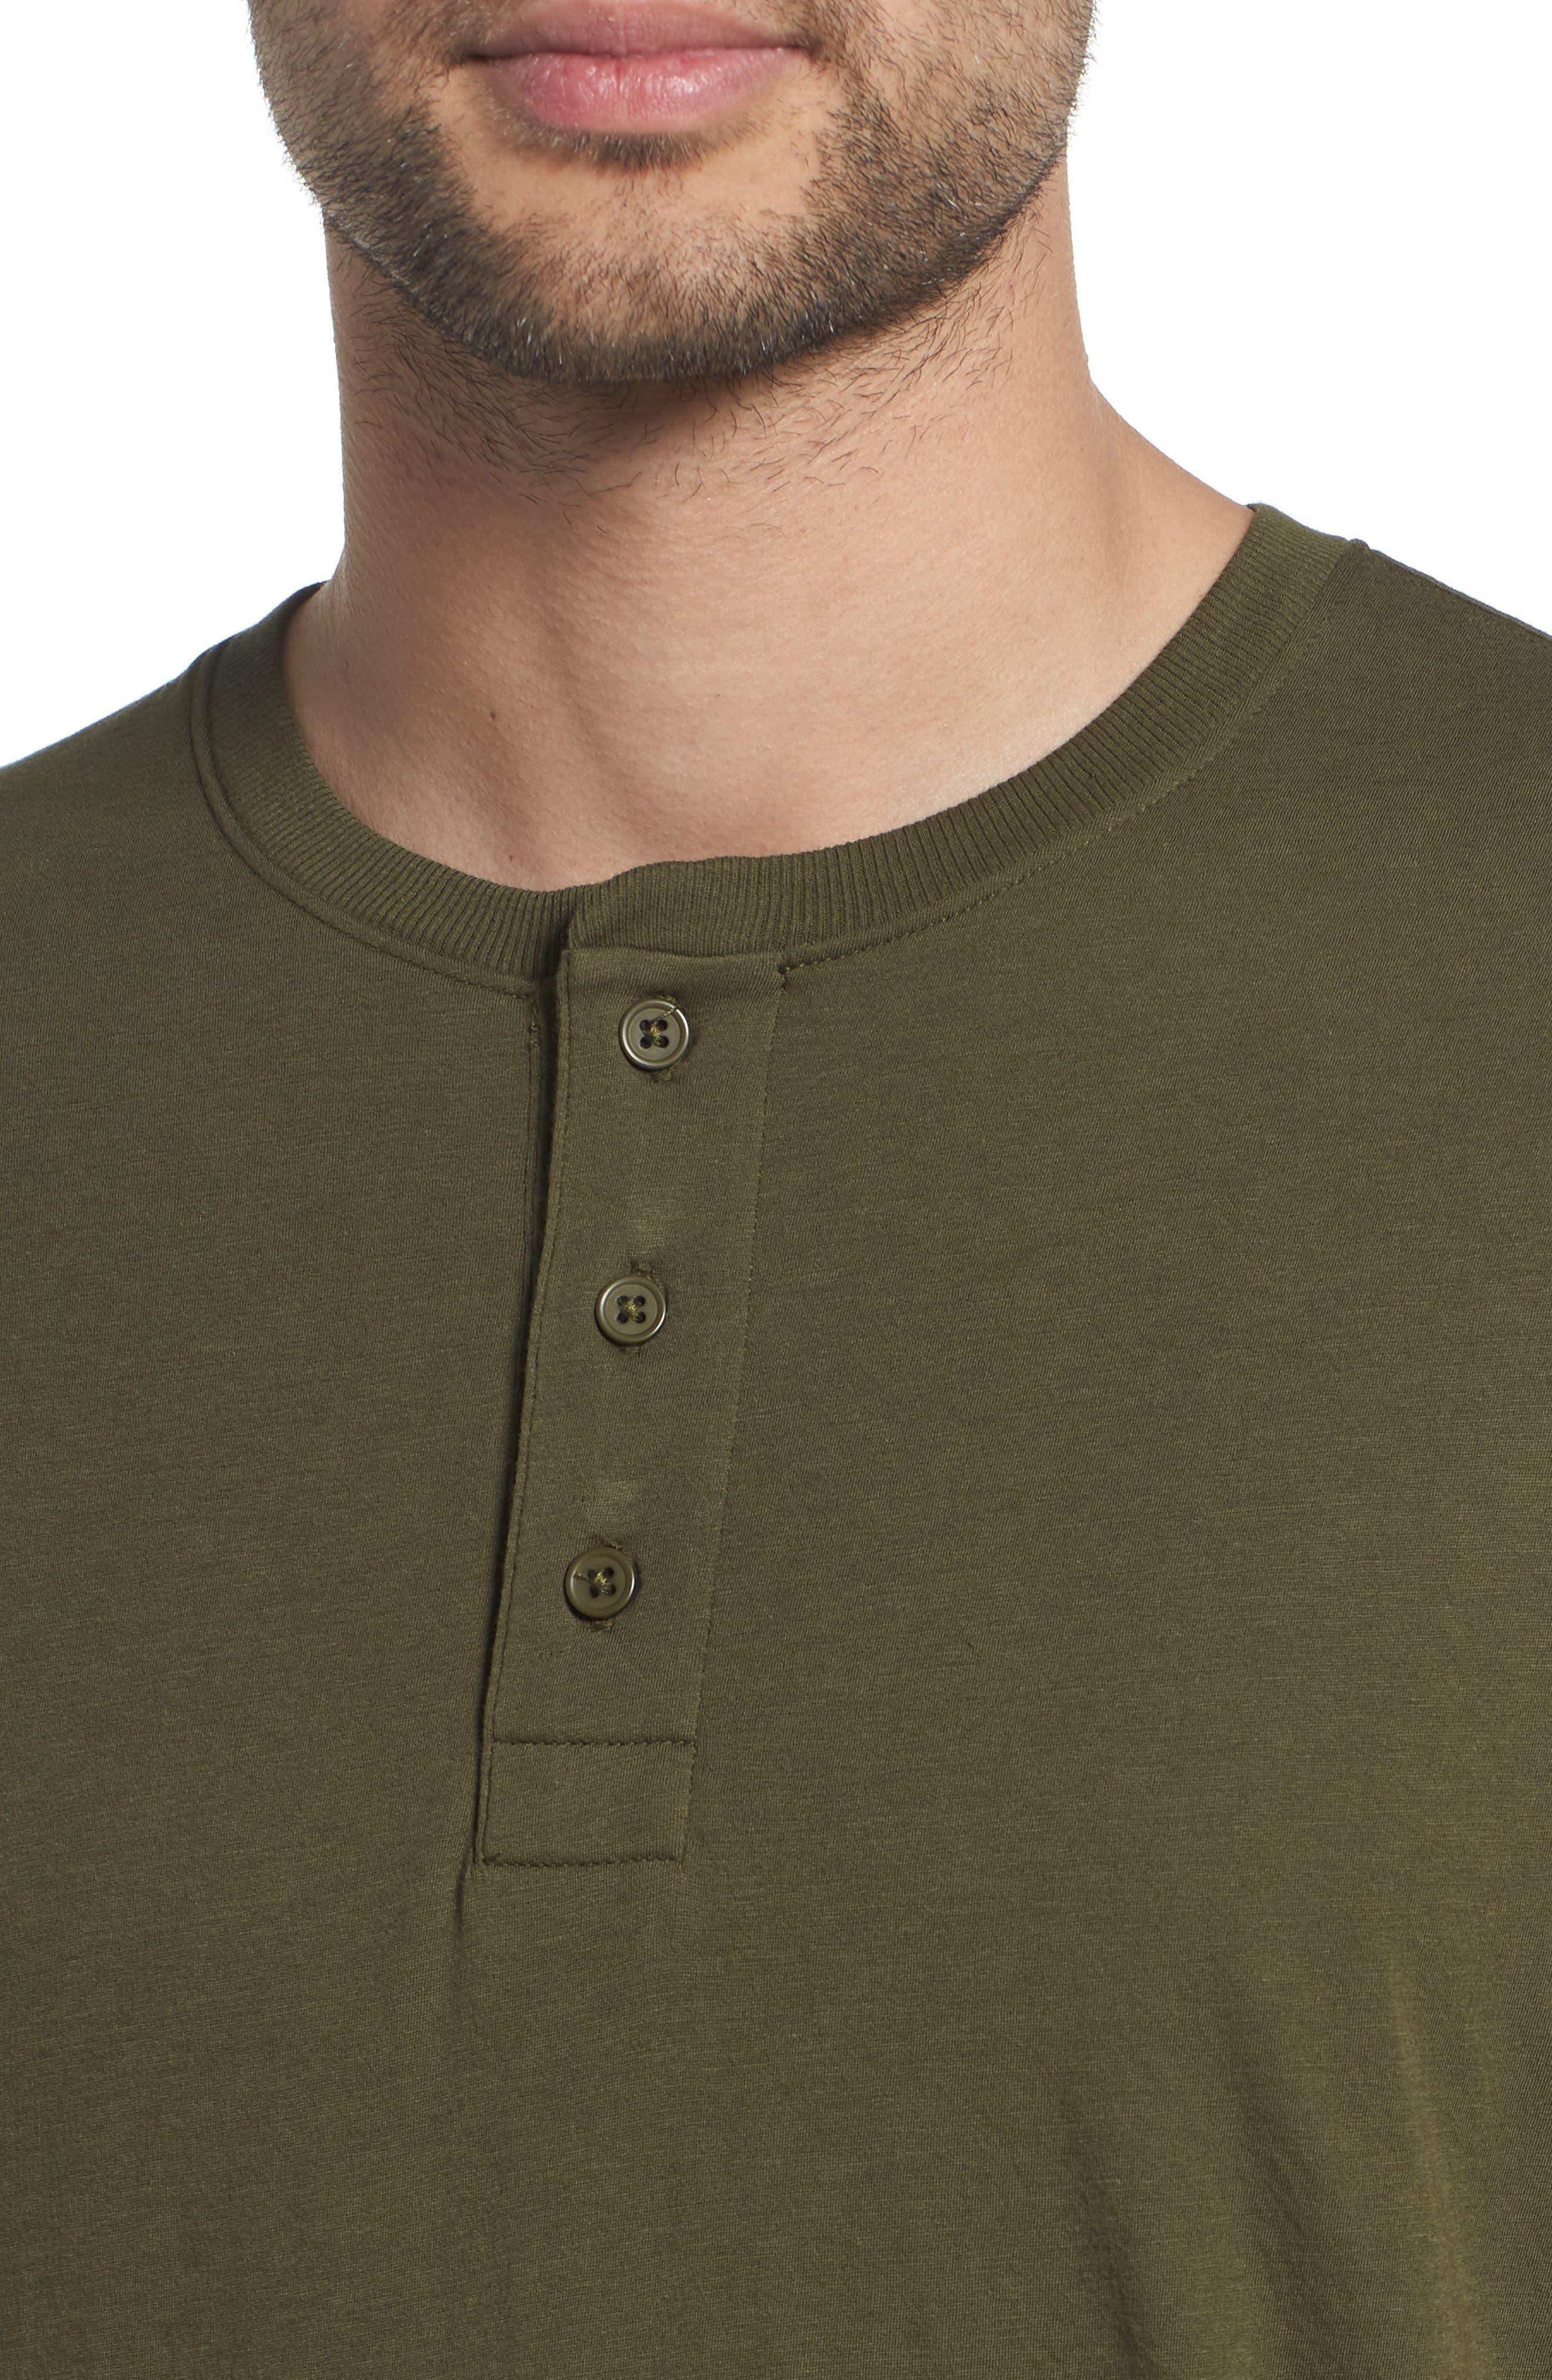 Layered Henley T-Shirt,                             Alternate thumbnail 4, color,                             FOLIAGE